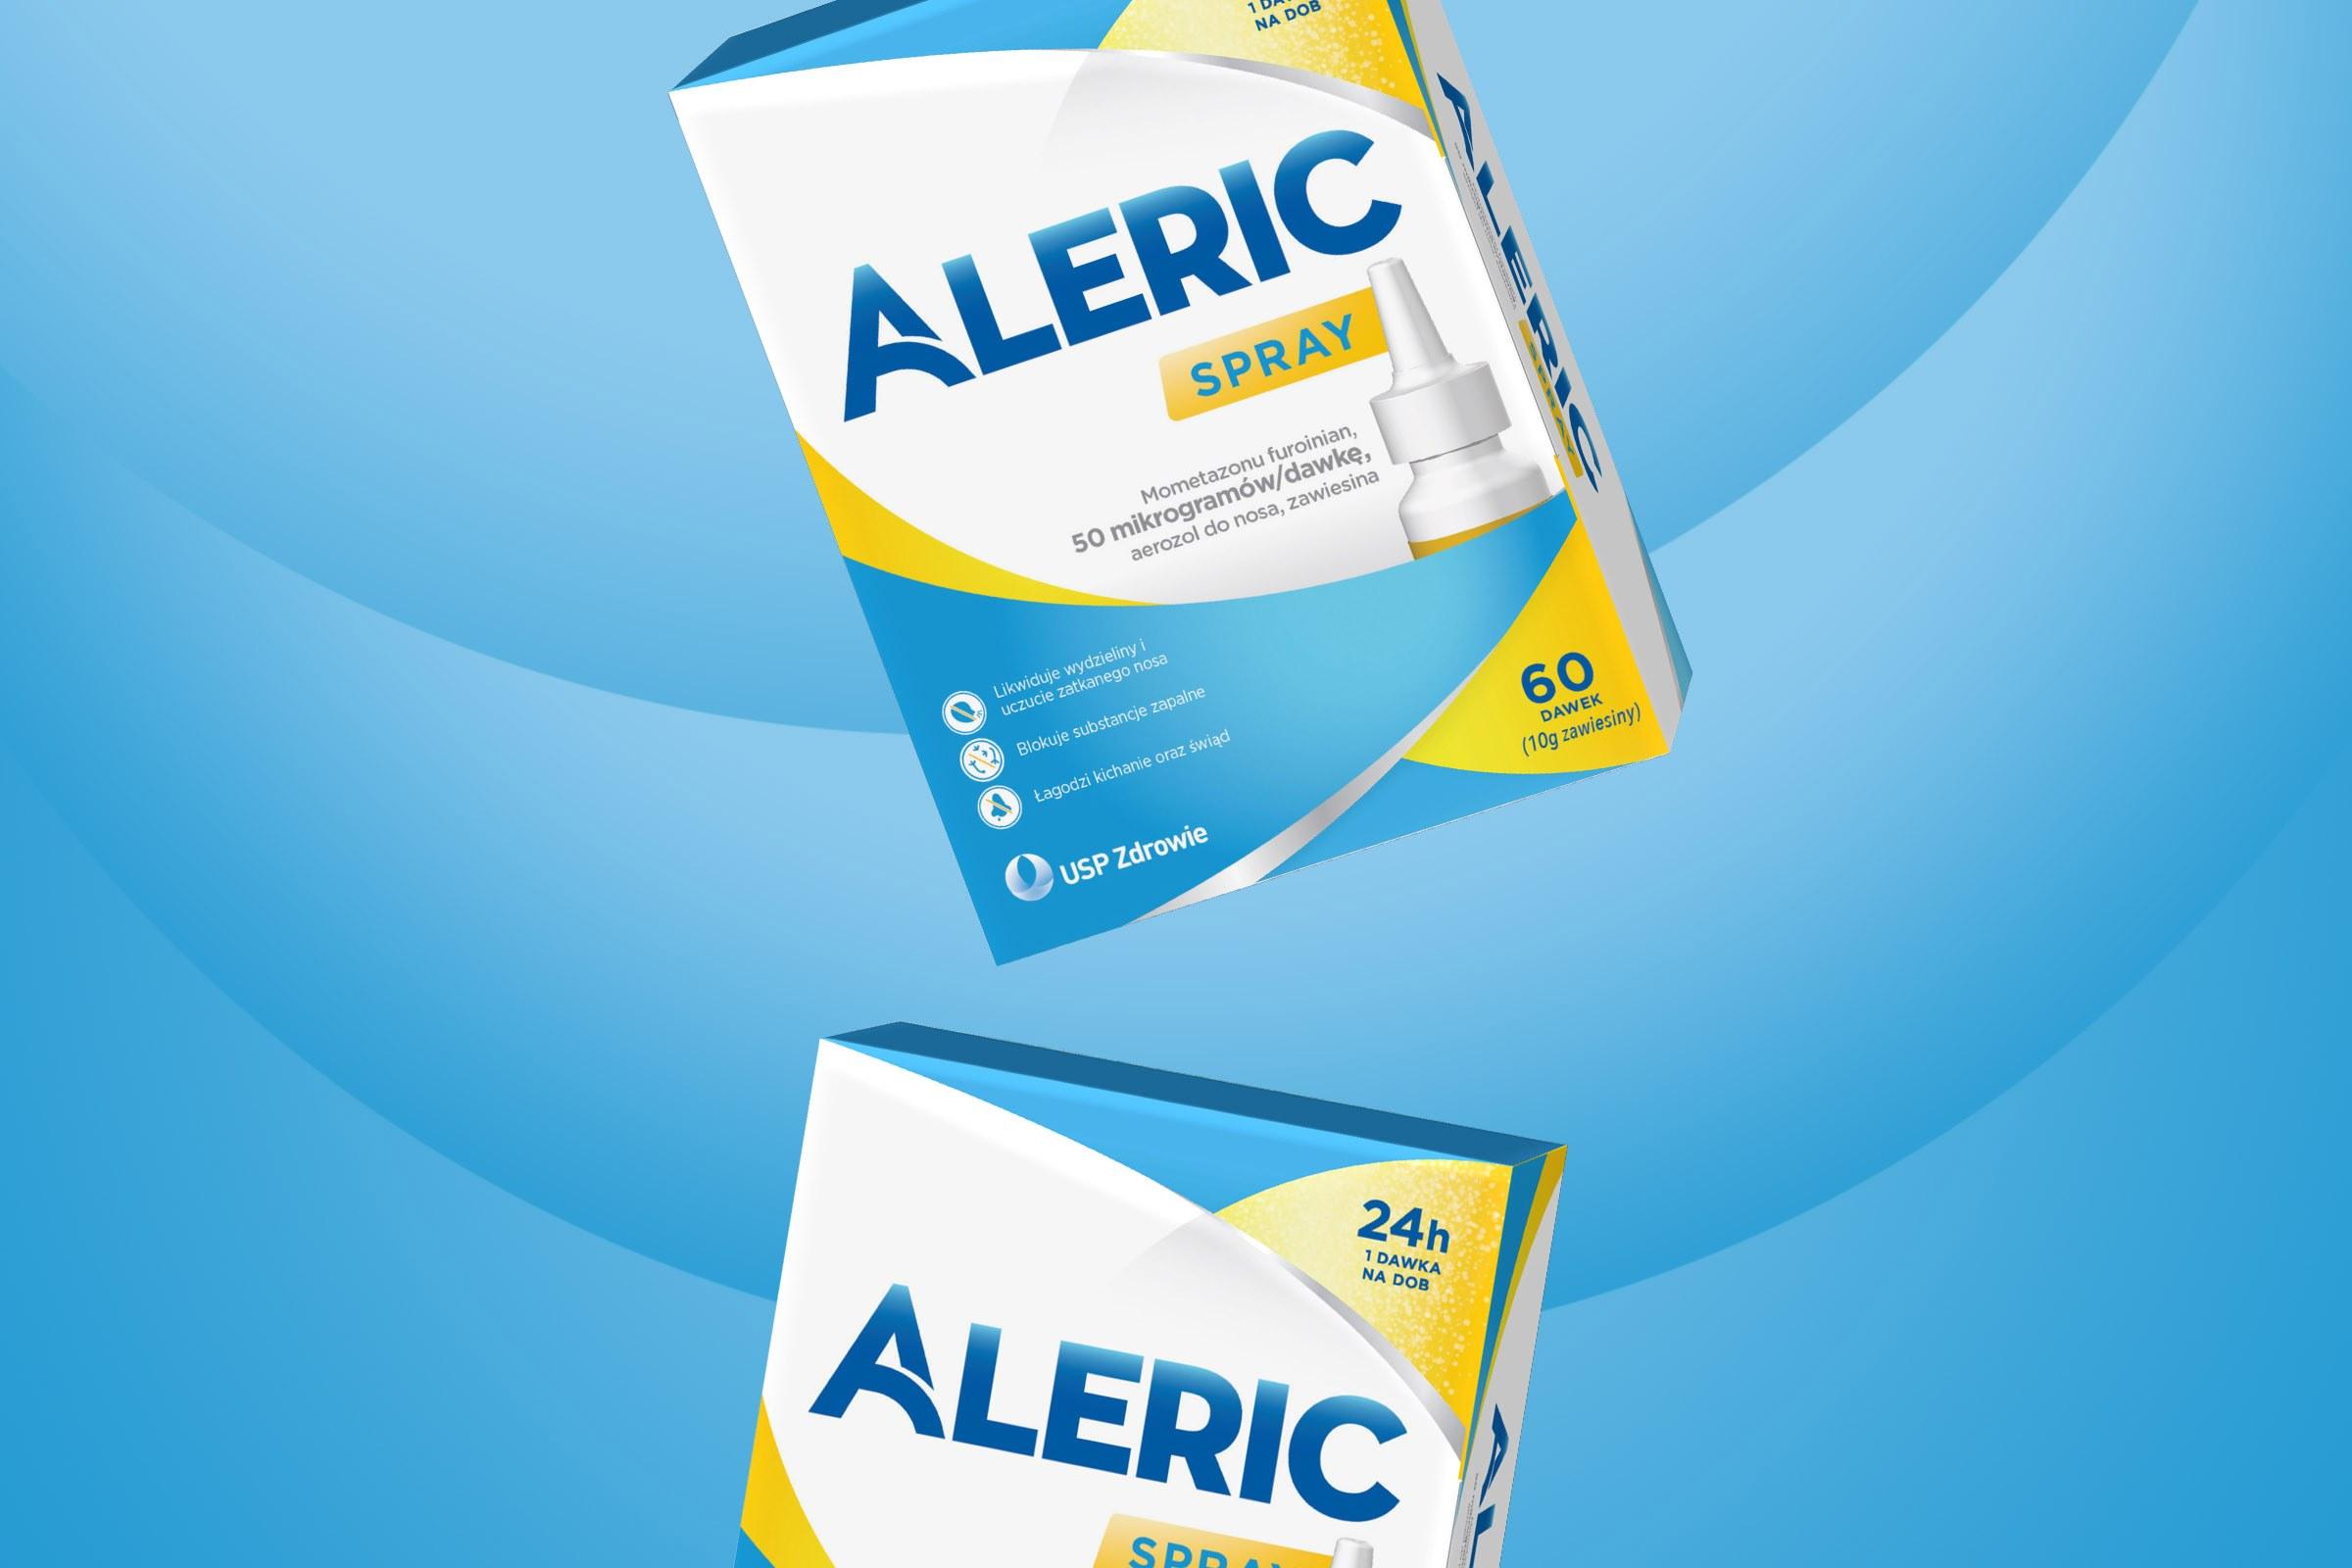 Aleric Spray Package Design